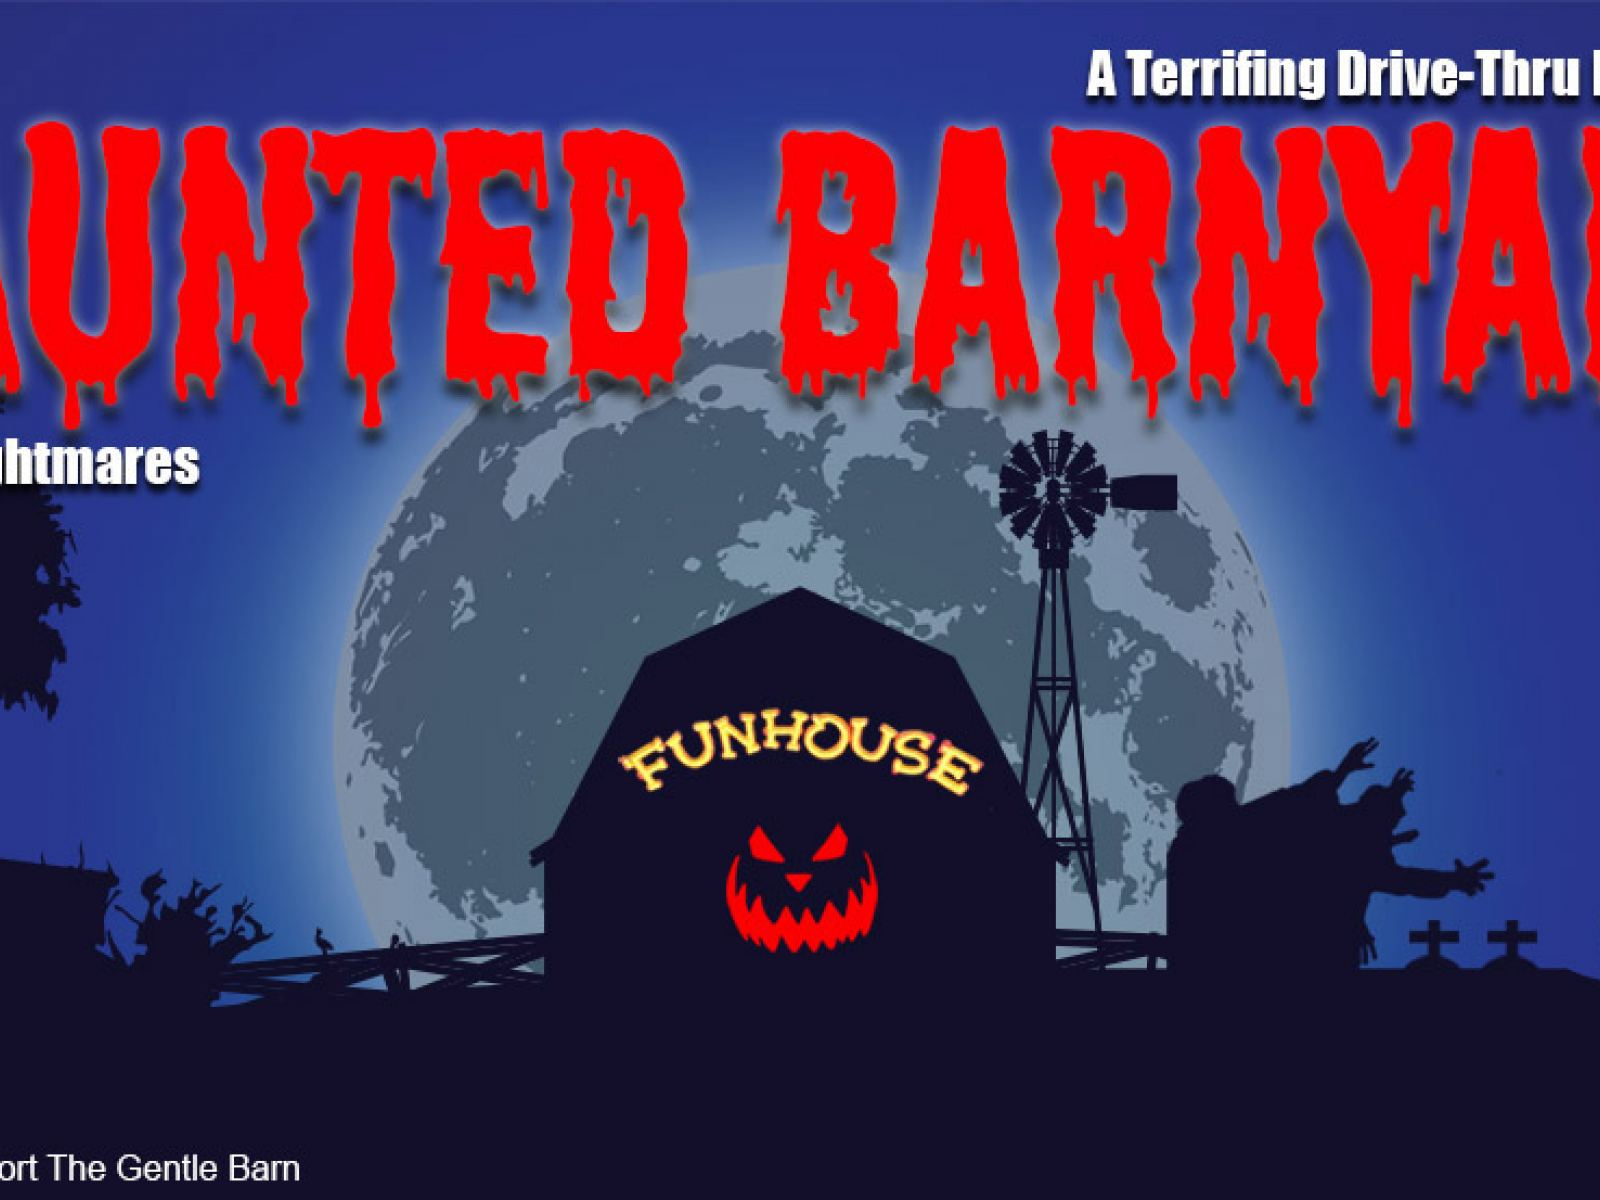 The Haunted Barnyard at The Gentle Barn